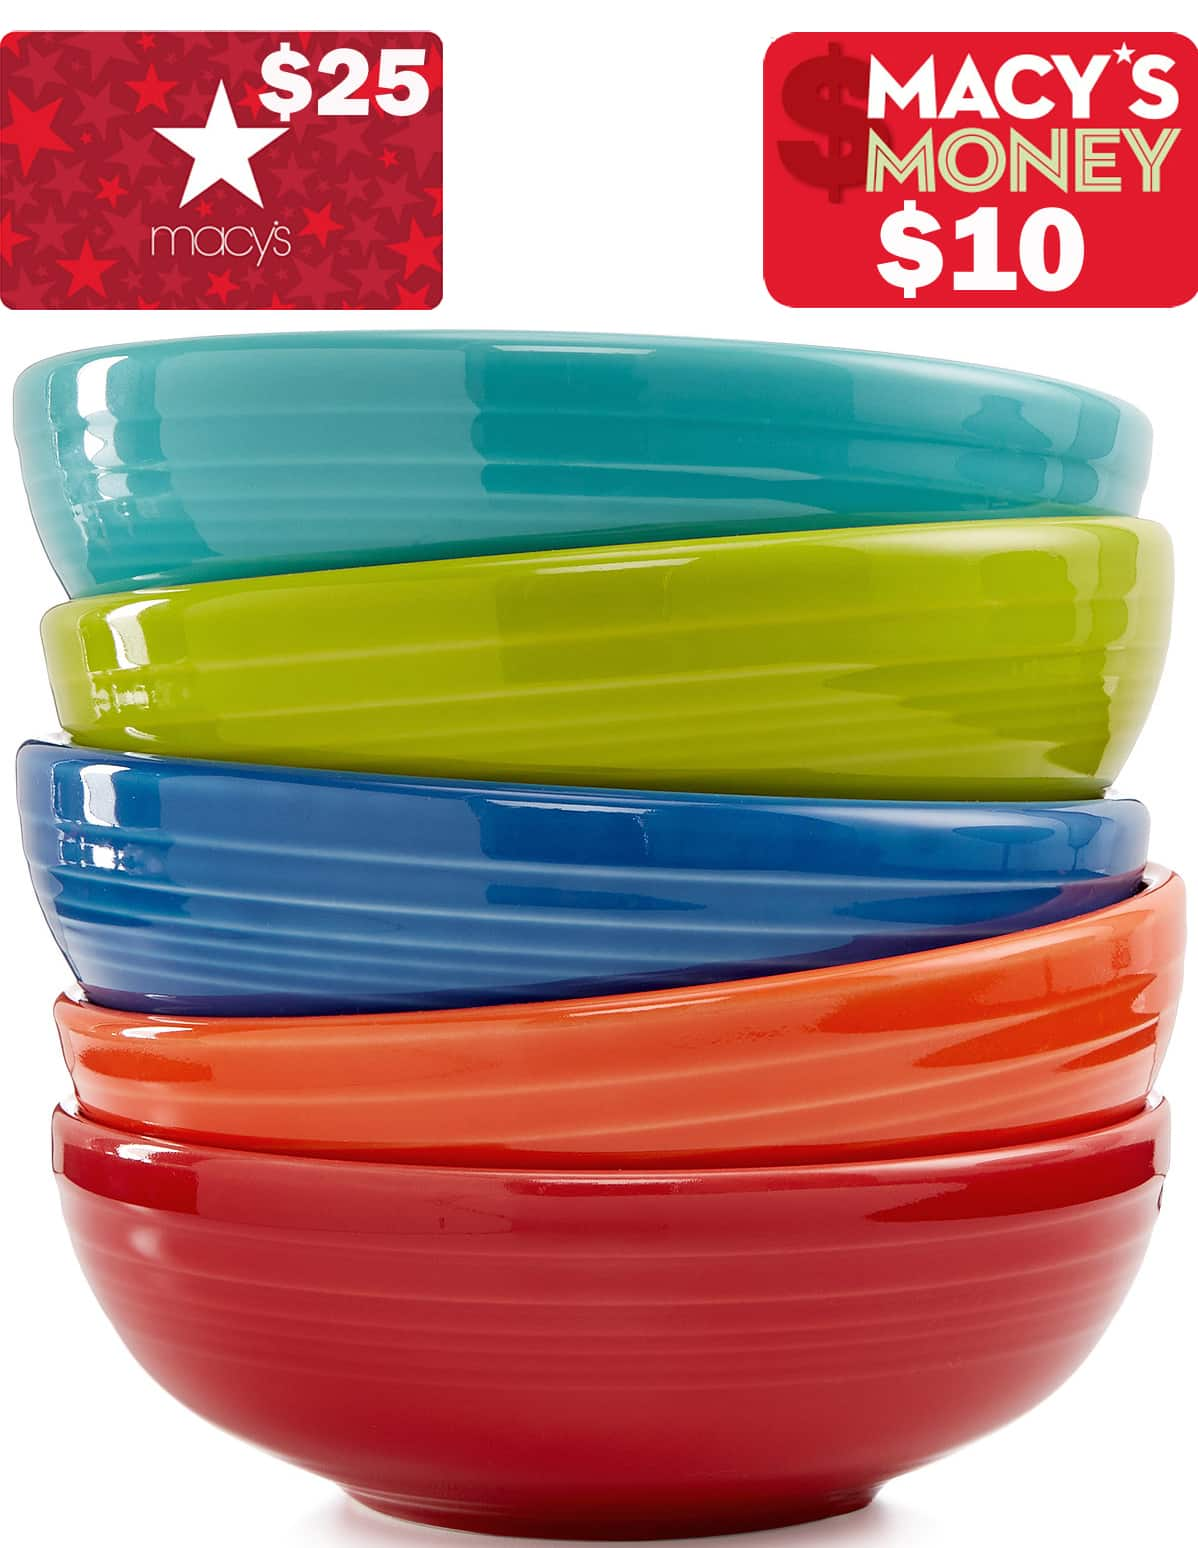 Fiesta A-La-Carte Dinnerware Pieces: Sale + $25 Macys eGift Card on $50 + $10 in Macys Money (after slickdeals rebate), 40-Oz Medium Bistro Bowl $9.60,  70-Oz Large Bistro Bowl $13